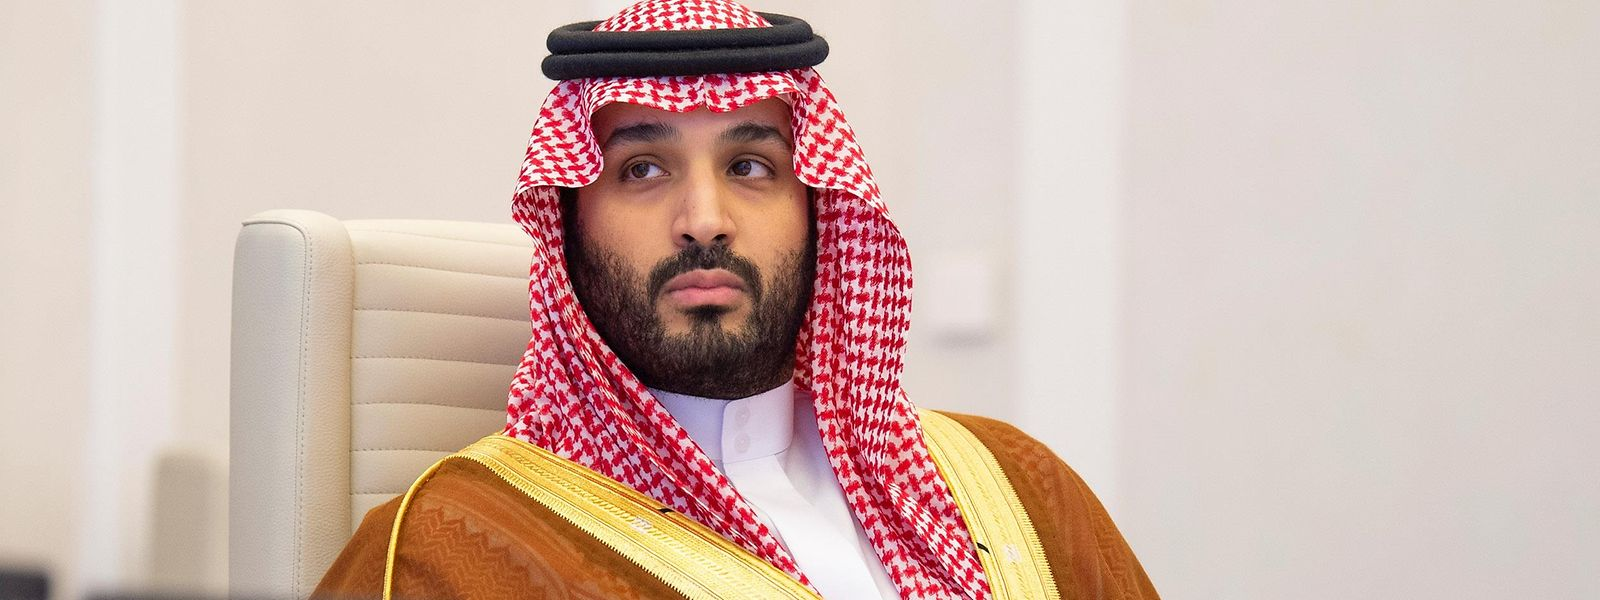 Kronprinz Mohammed bin Salman bin Abdulaziz Al Saud von Saudi-Arabien.